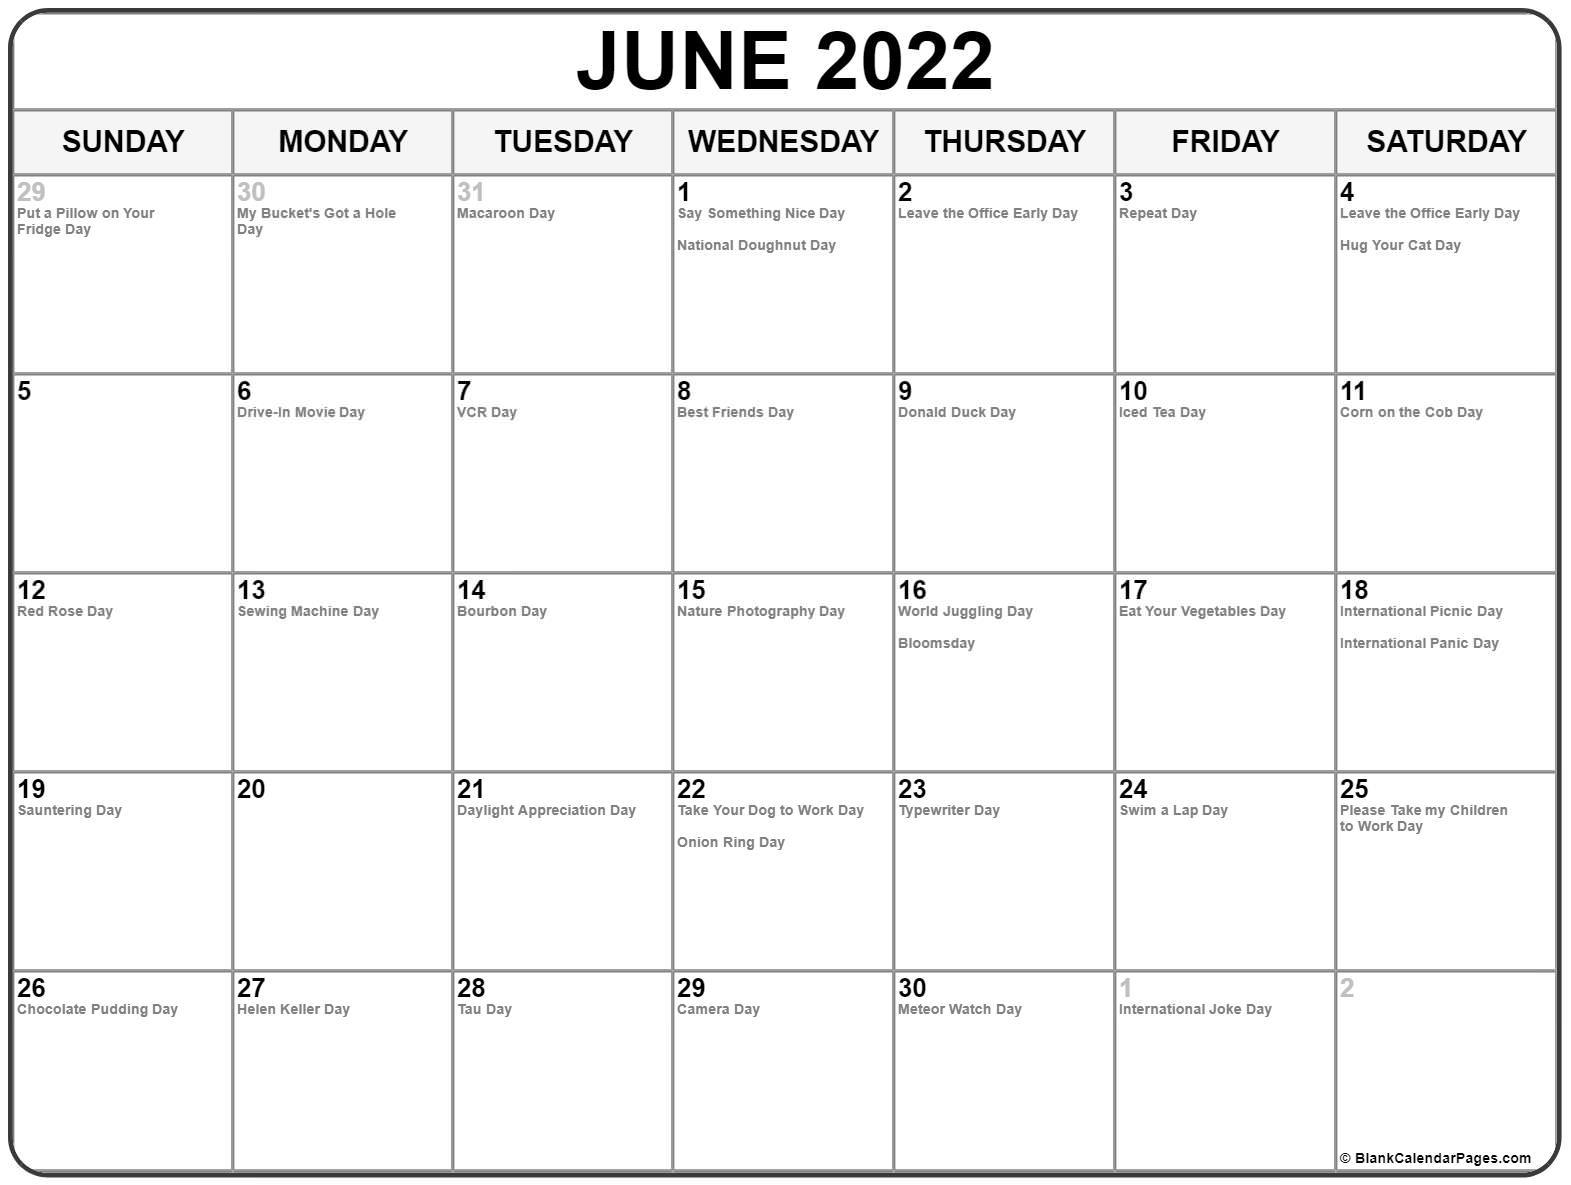 2022 Calendar Including Bank Holidays